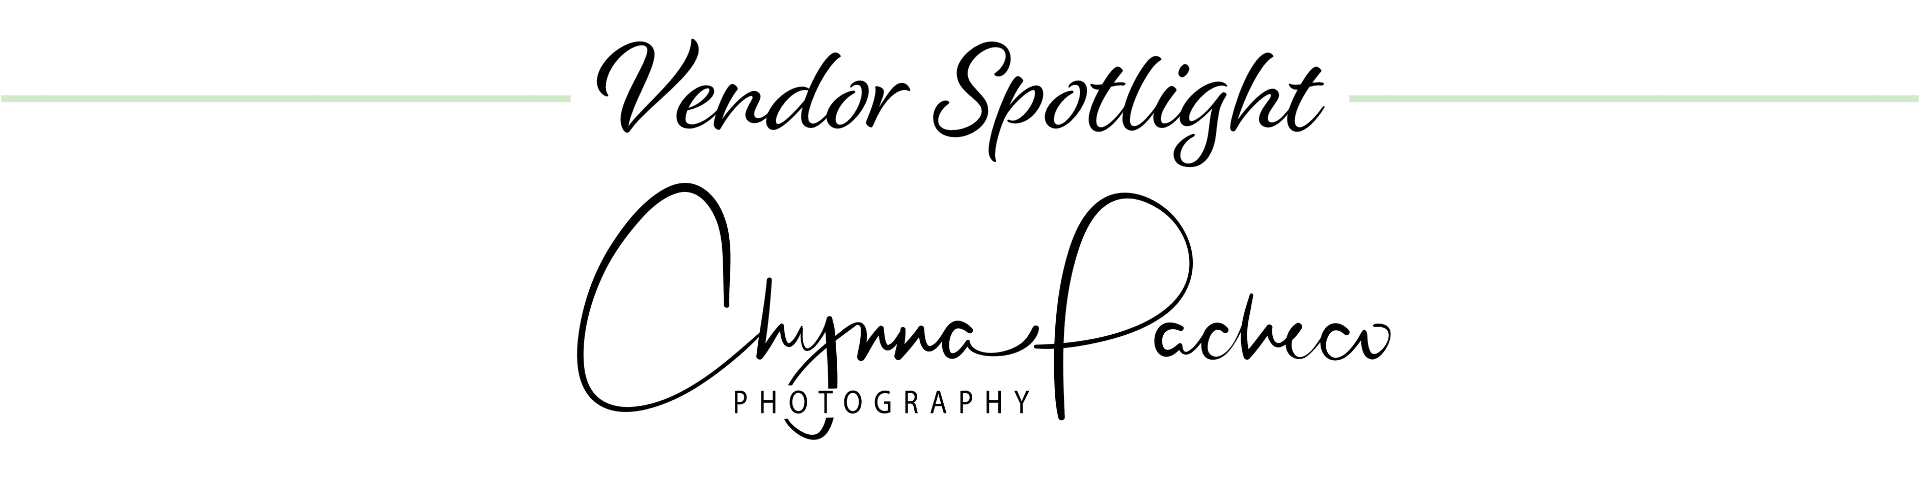 Chynna Pacheco Photography logo